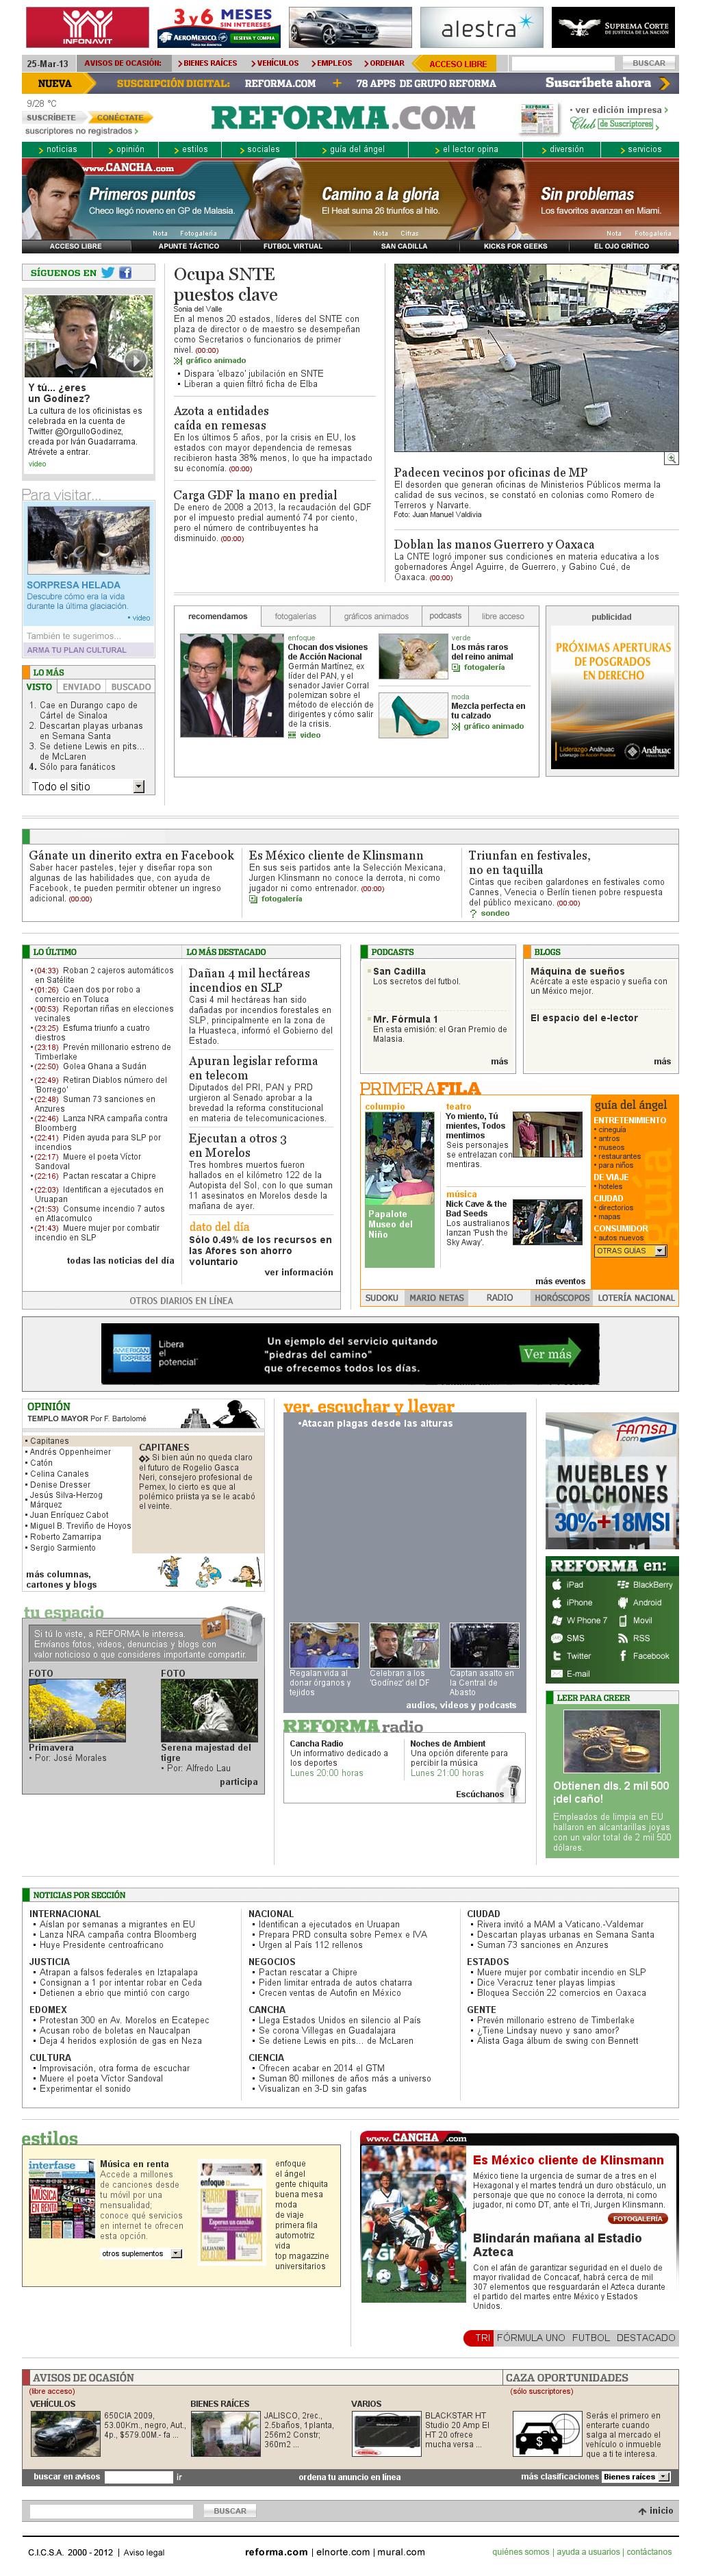 Reforma.com at Monday March 25, 2013, 11:40 a.m. UTC